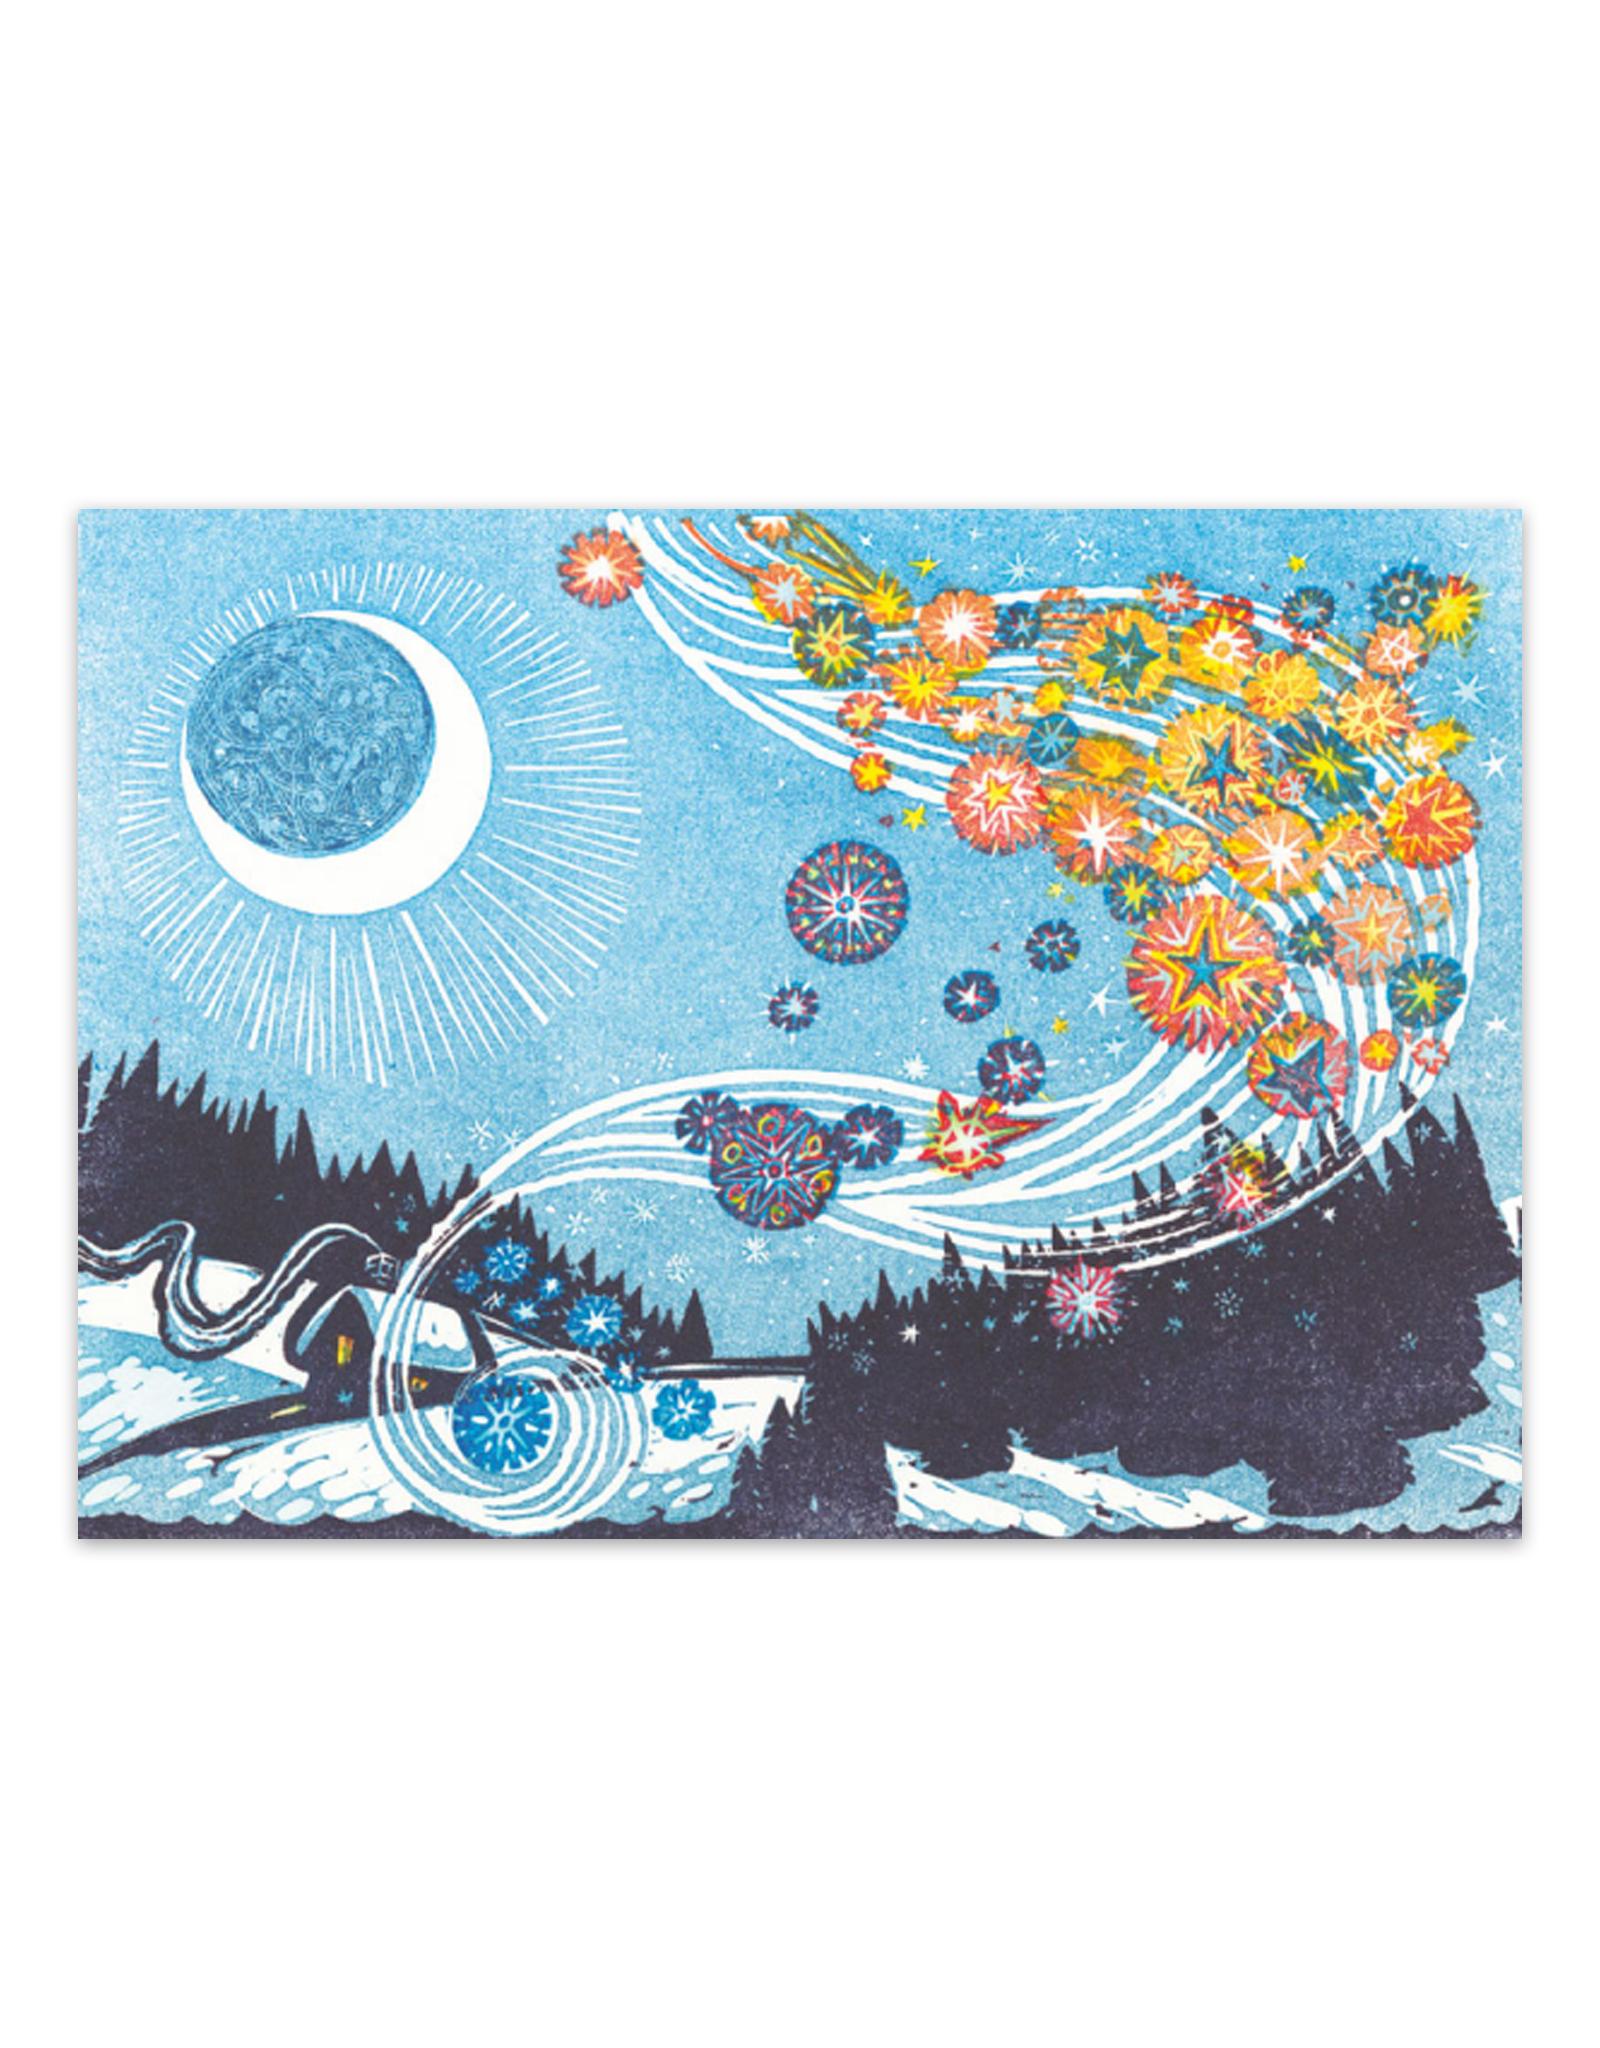 Cards Falling Stars